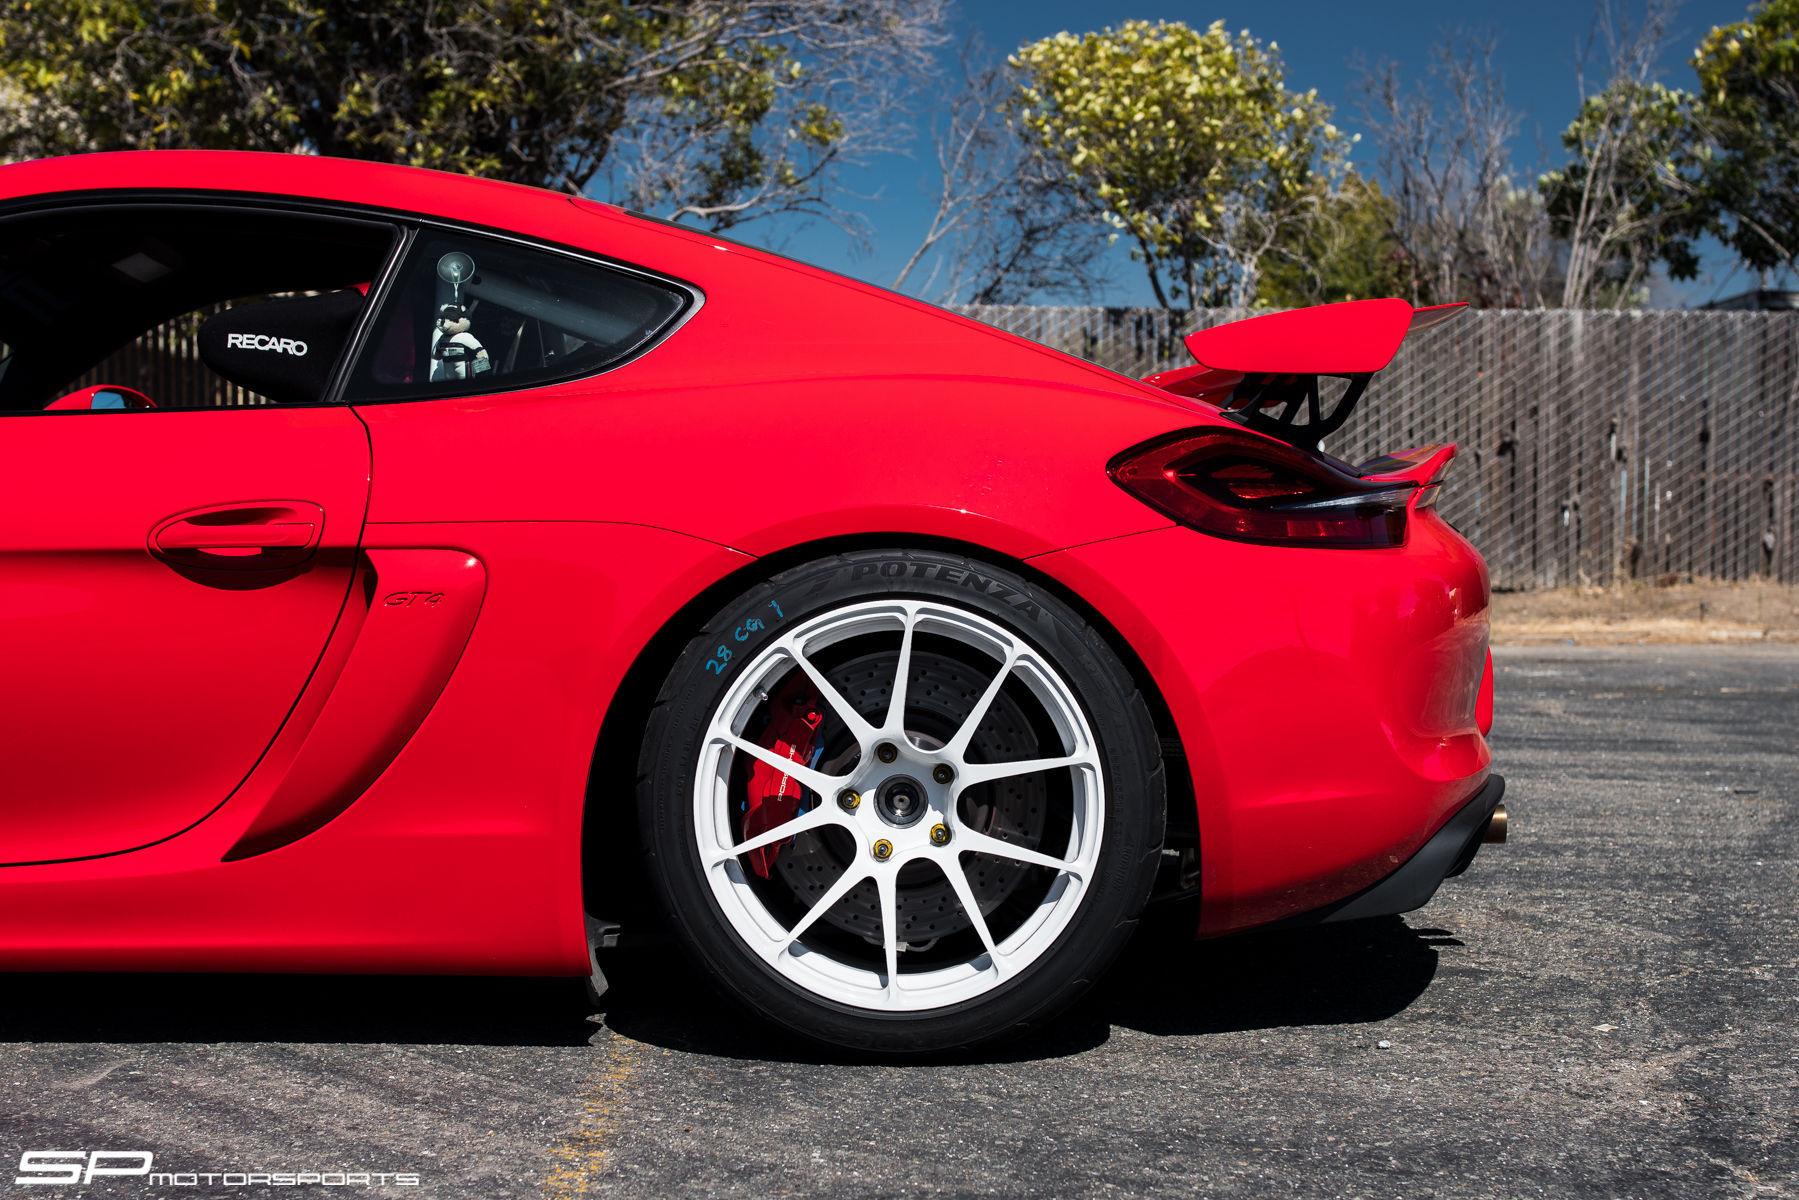 2016 Porsche Cayman | SP Motorsports' Porsche Cayman GT4 Shop Car on Forgeline One Piece Forged Monoblock GA1R Open Lug Wheels